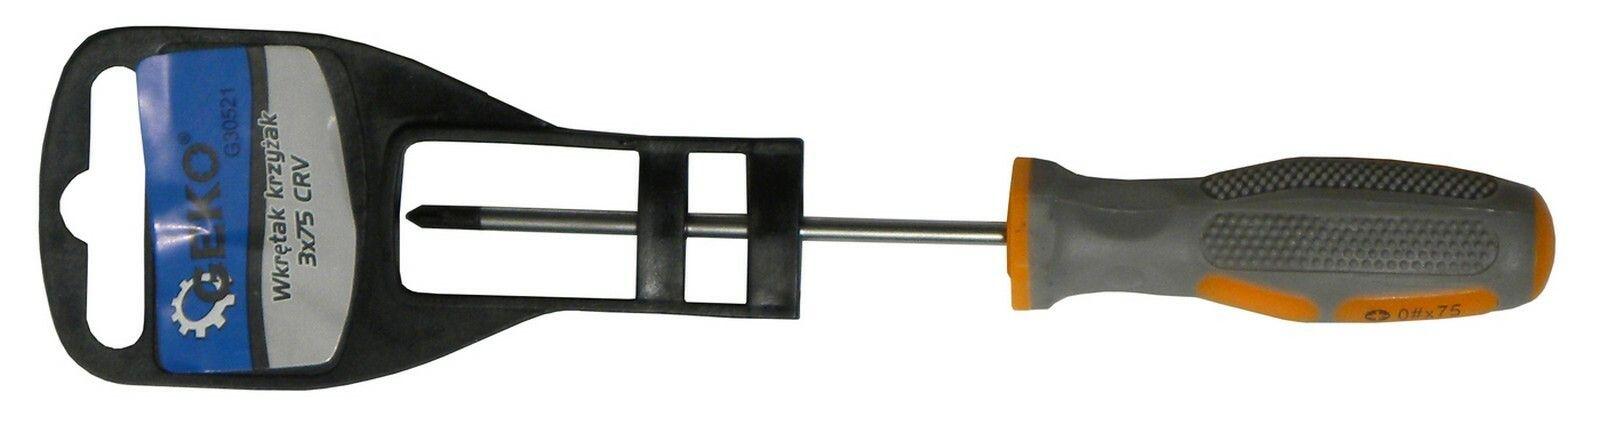 Šroubovák křížový, PH 3x75mm, CrV, GEKO